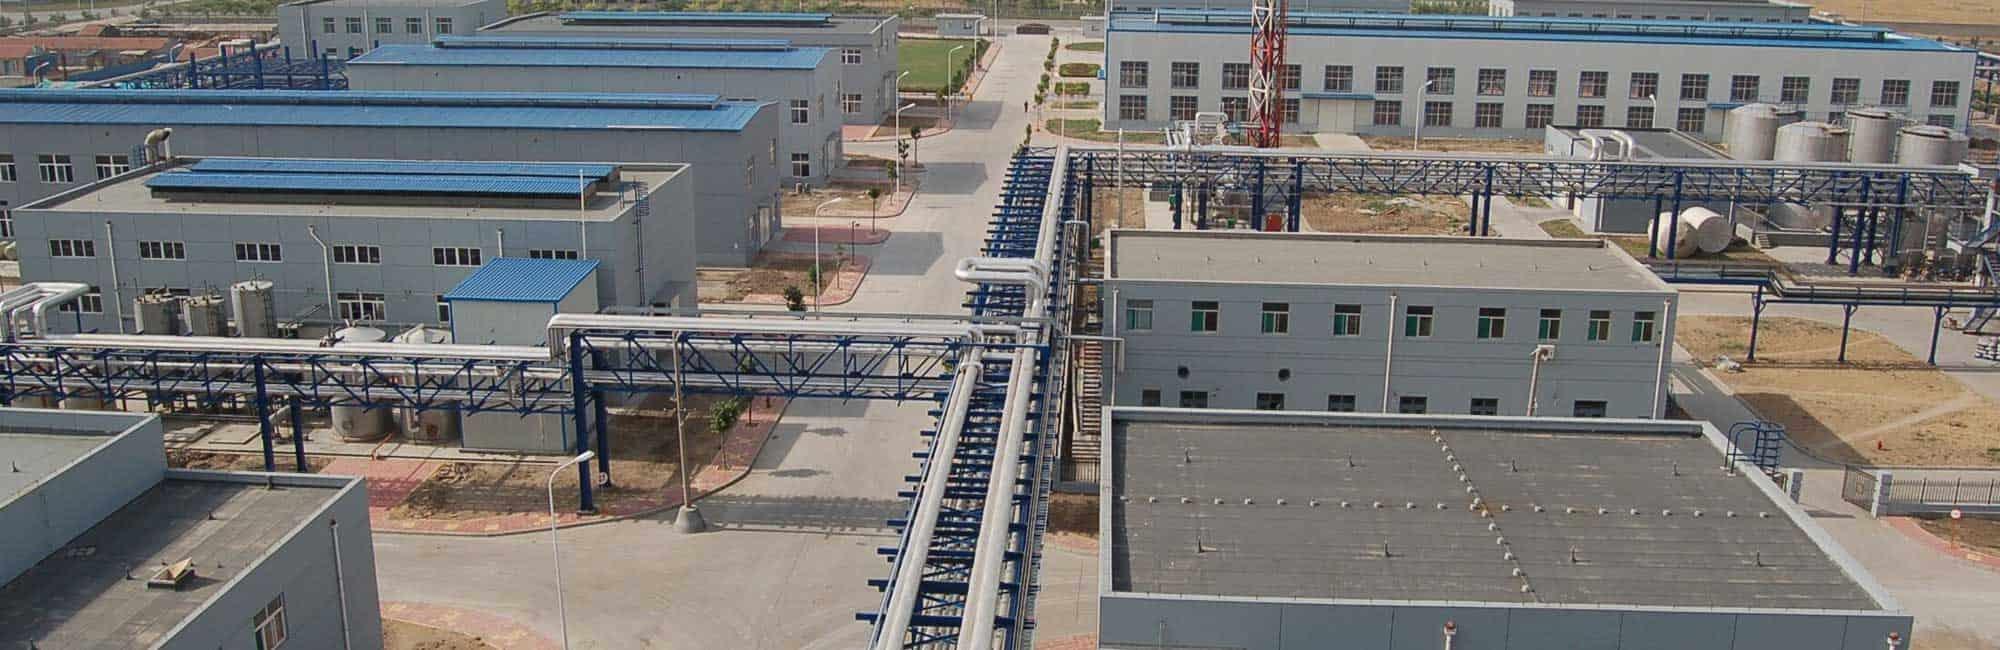 zhonglan industry factory 2